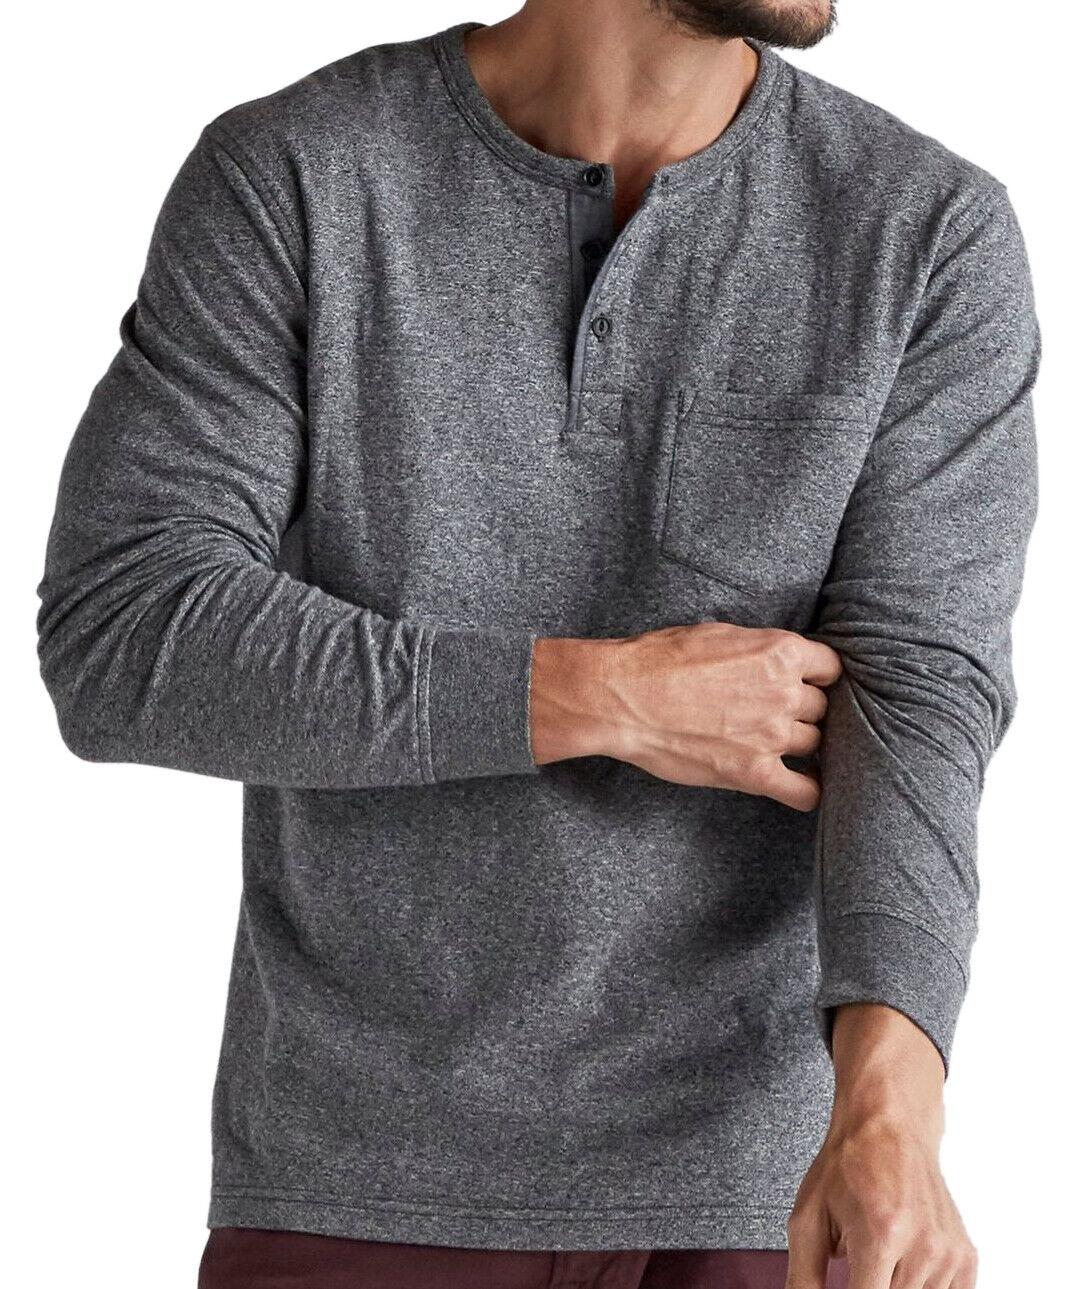 001 Black Lucky Brand Men/'s 7MDK020 Jaspe Henley Shirt 3881-8 Medium